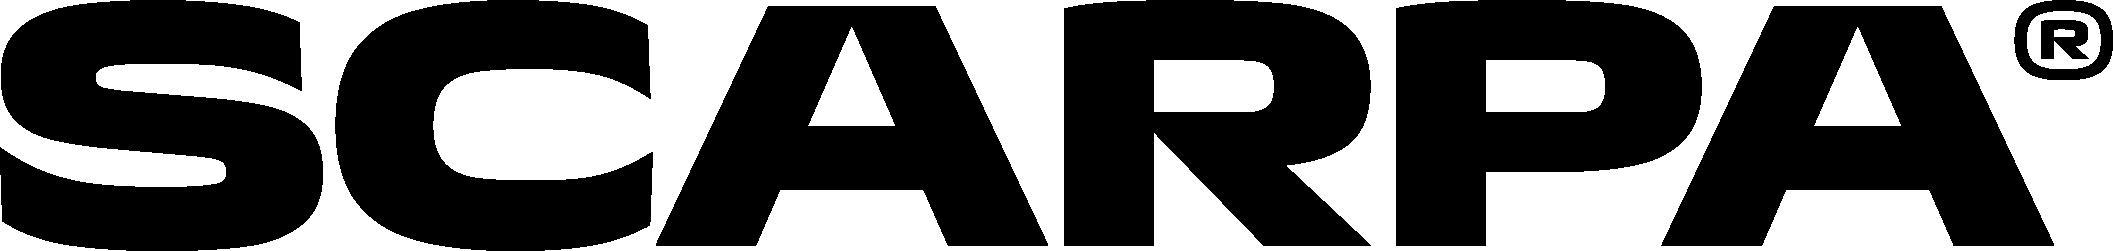 Logo Scarpa